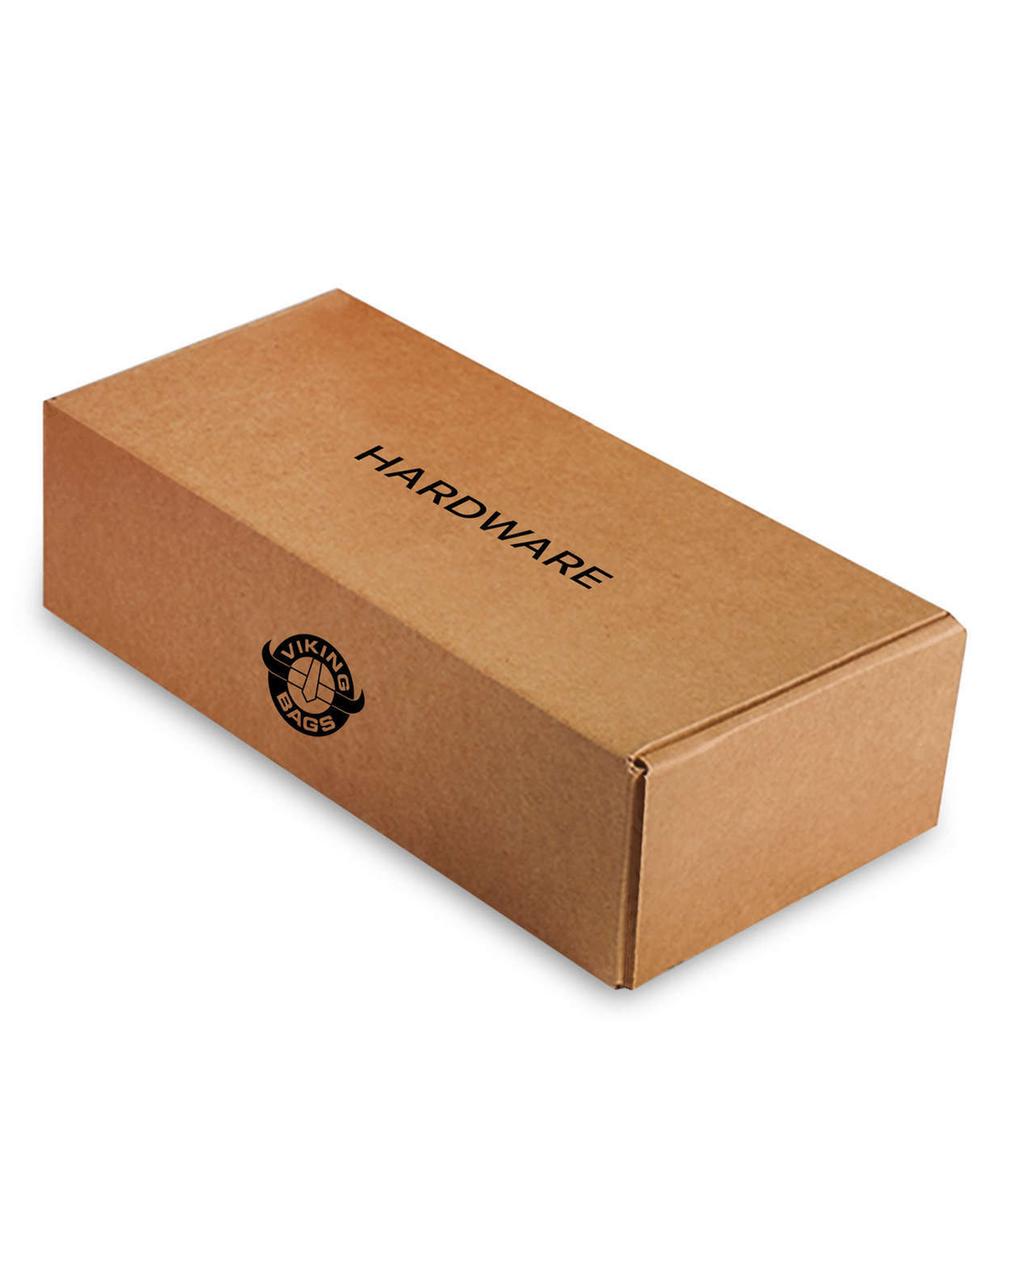 Honda 750 Shadow Phantom Medium Charger Single Strap Motorcycle Saddlebags box